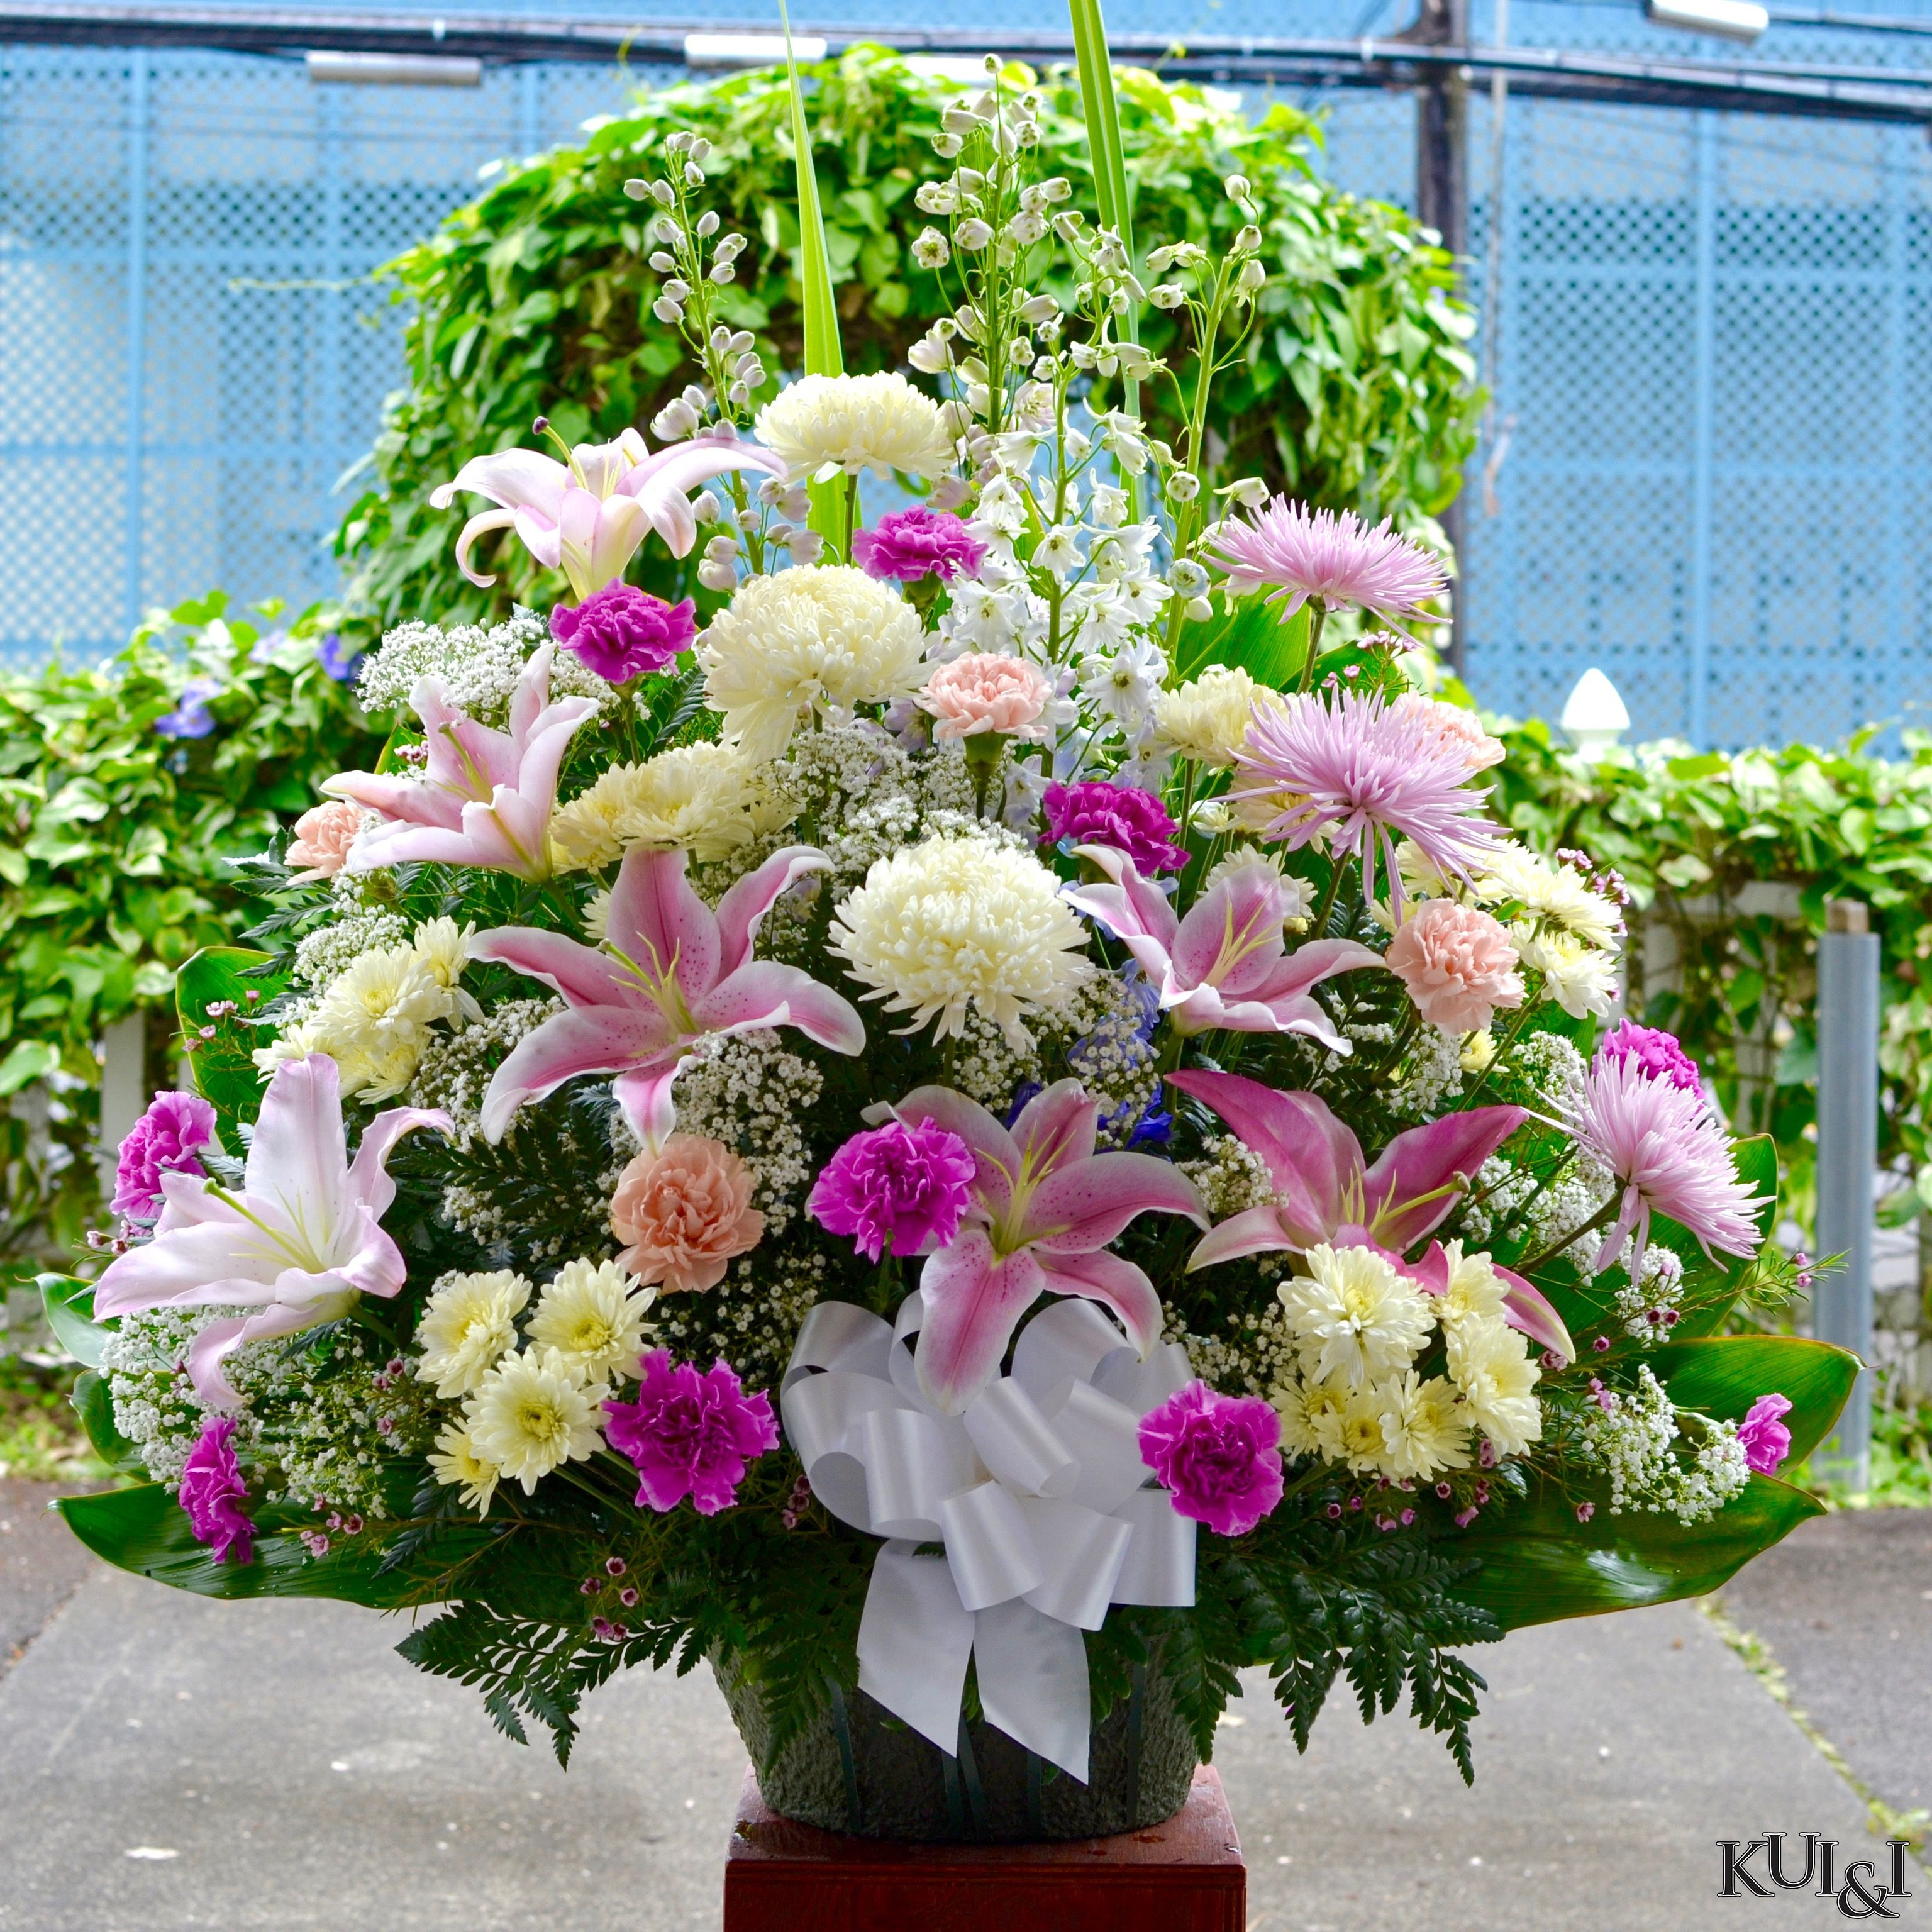 Pink Funeral Arrangement Kui I Florist Llc Hilo Hawaii